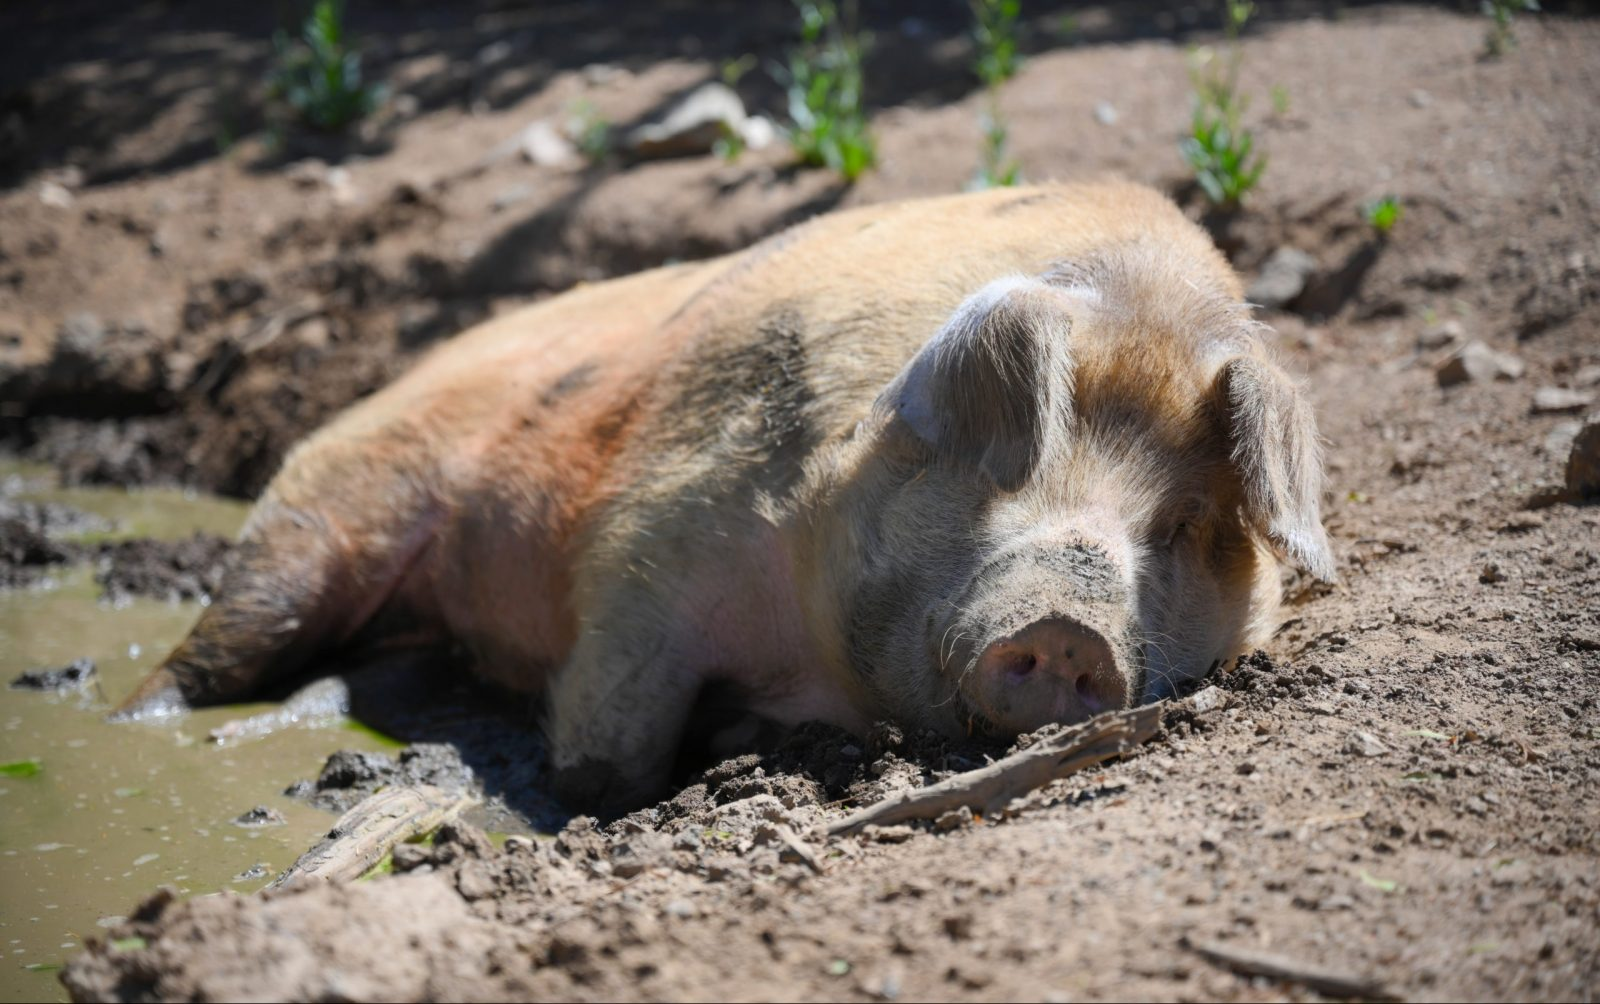 Junip Sydney at Farm Sanctuary's Southern California shelter